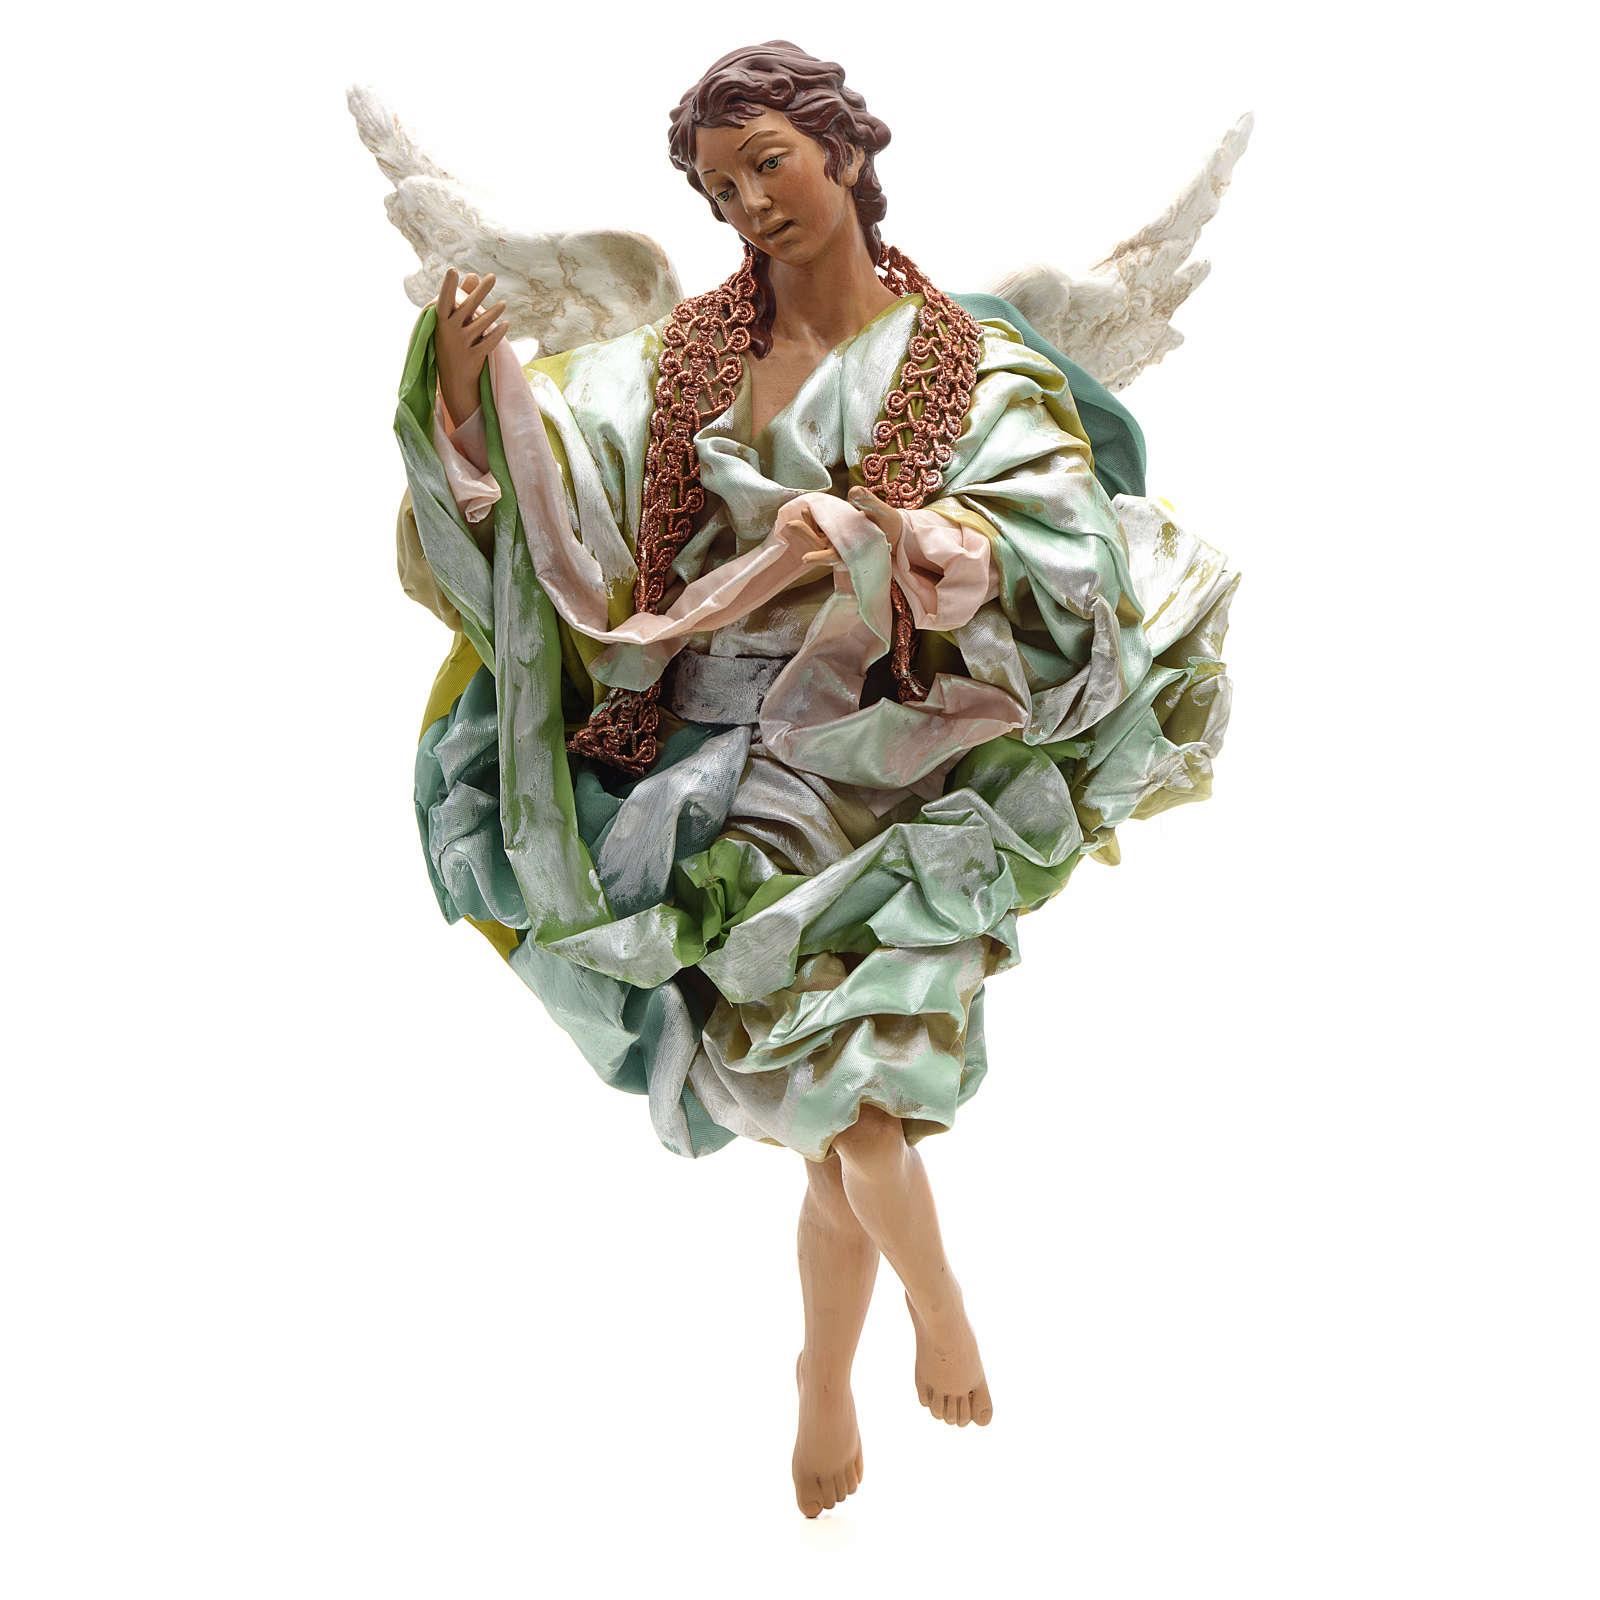 Angelo verde terracotta presepe napoletano 45 cm 4